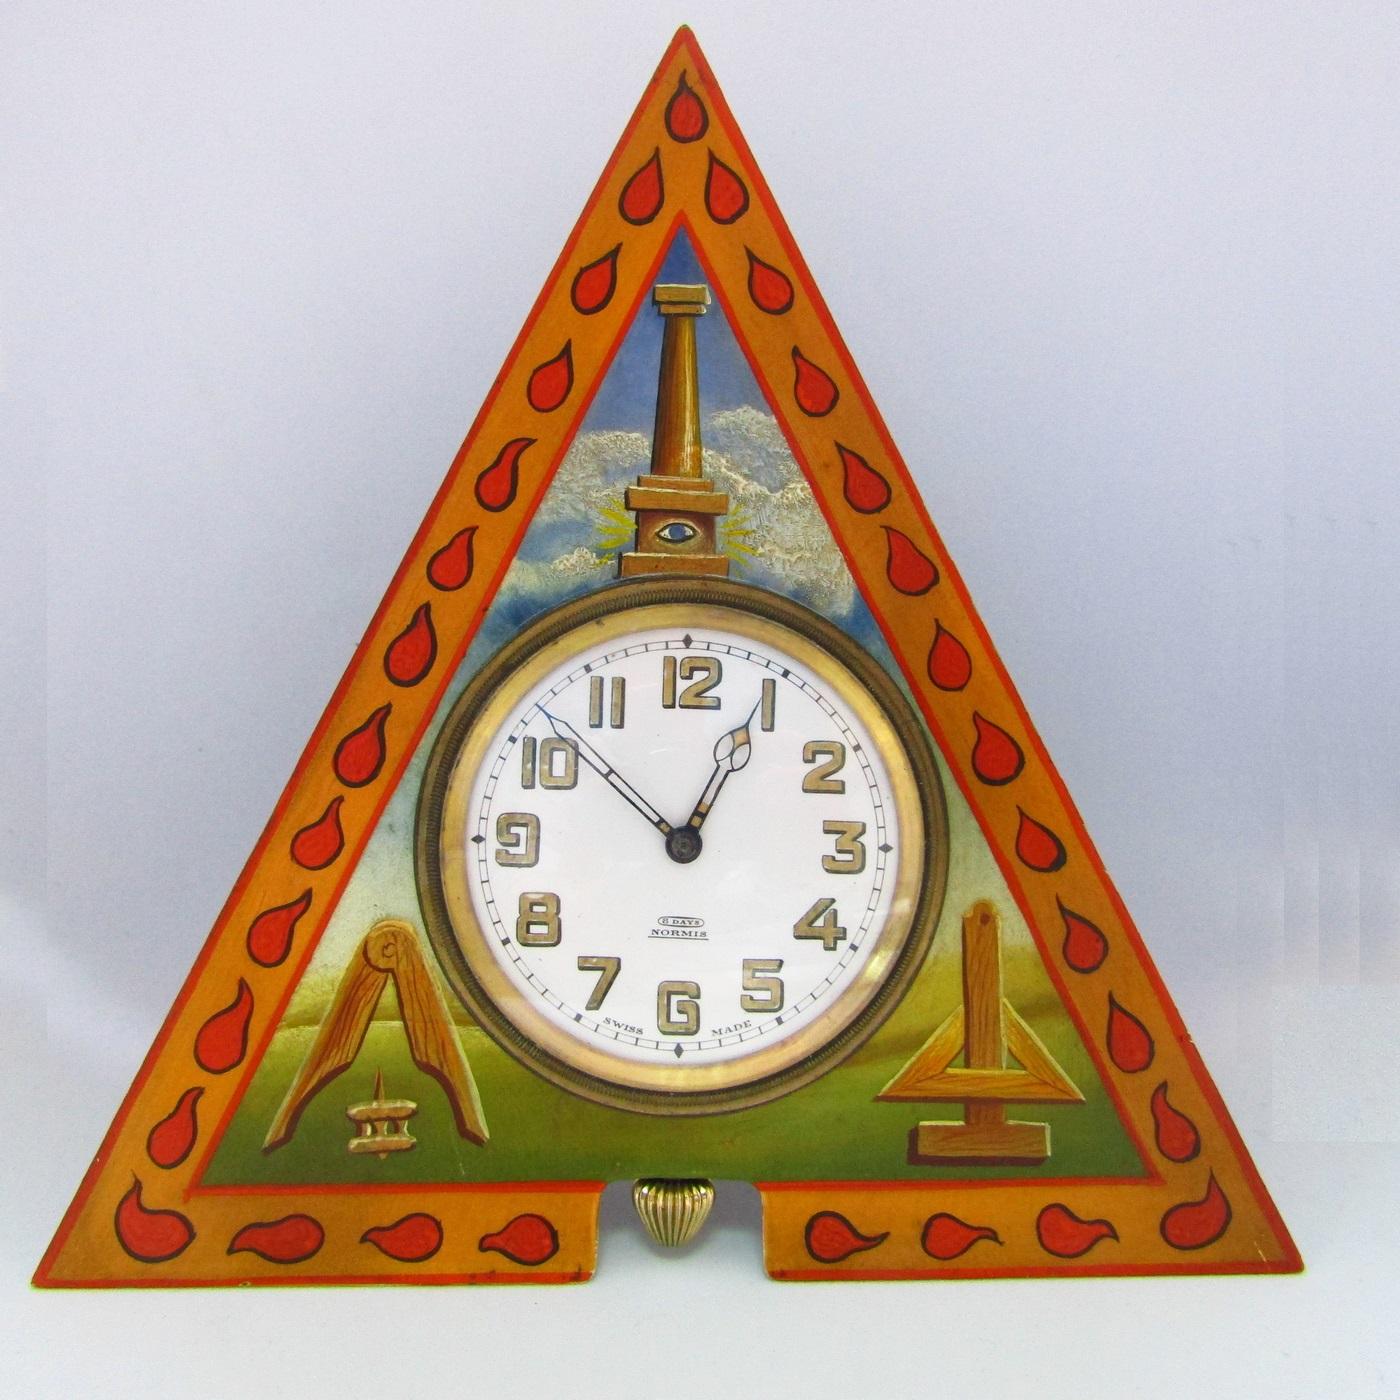 GOBRING WATCH Co. Reloj de bolsillo-sobremesa Masónico, 8 días cuerda. Suiza, finales siglo XIX.